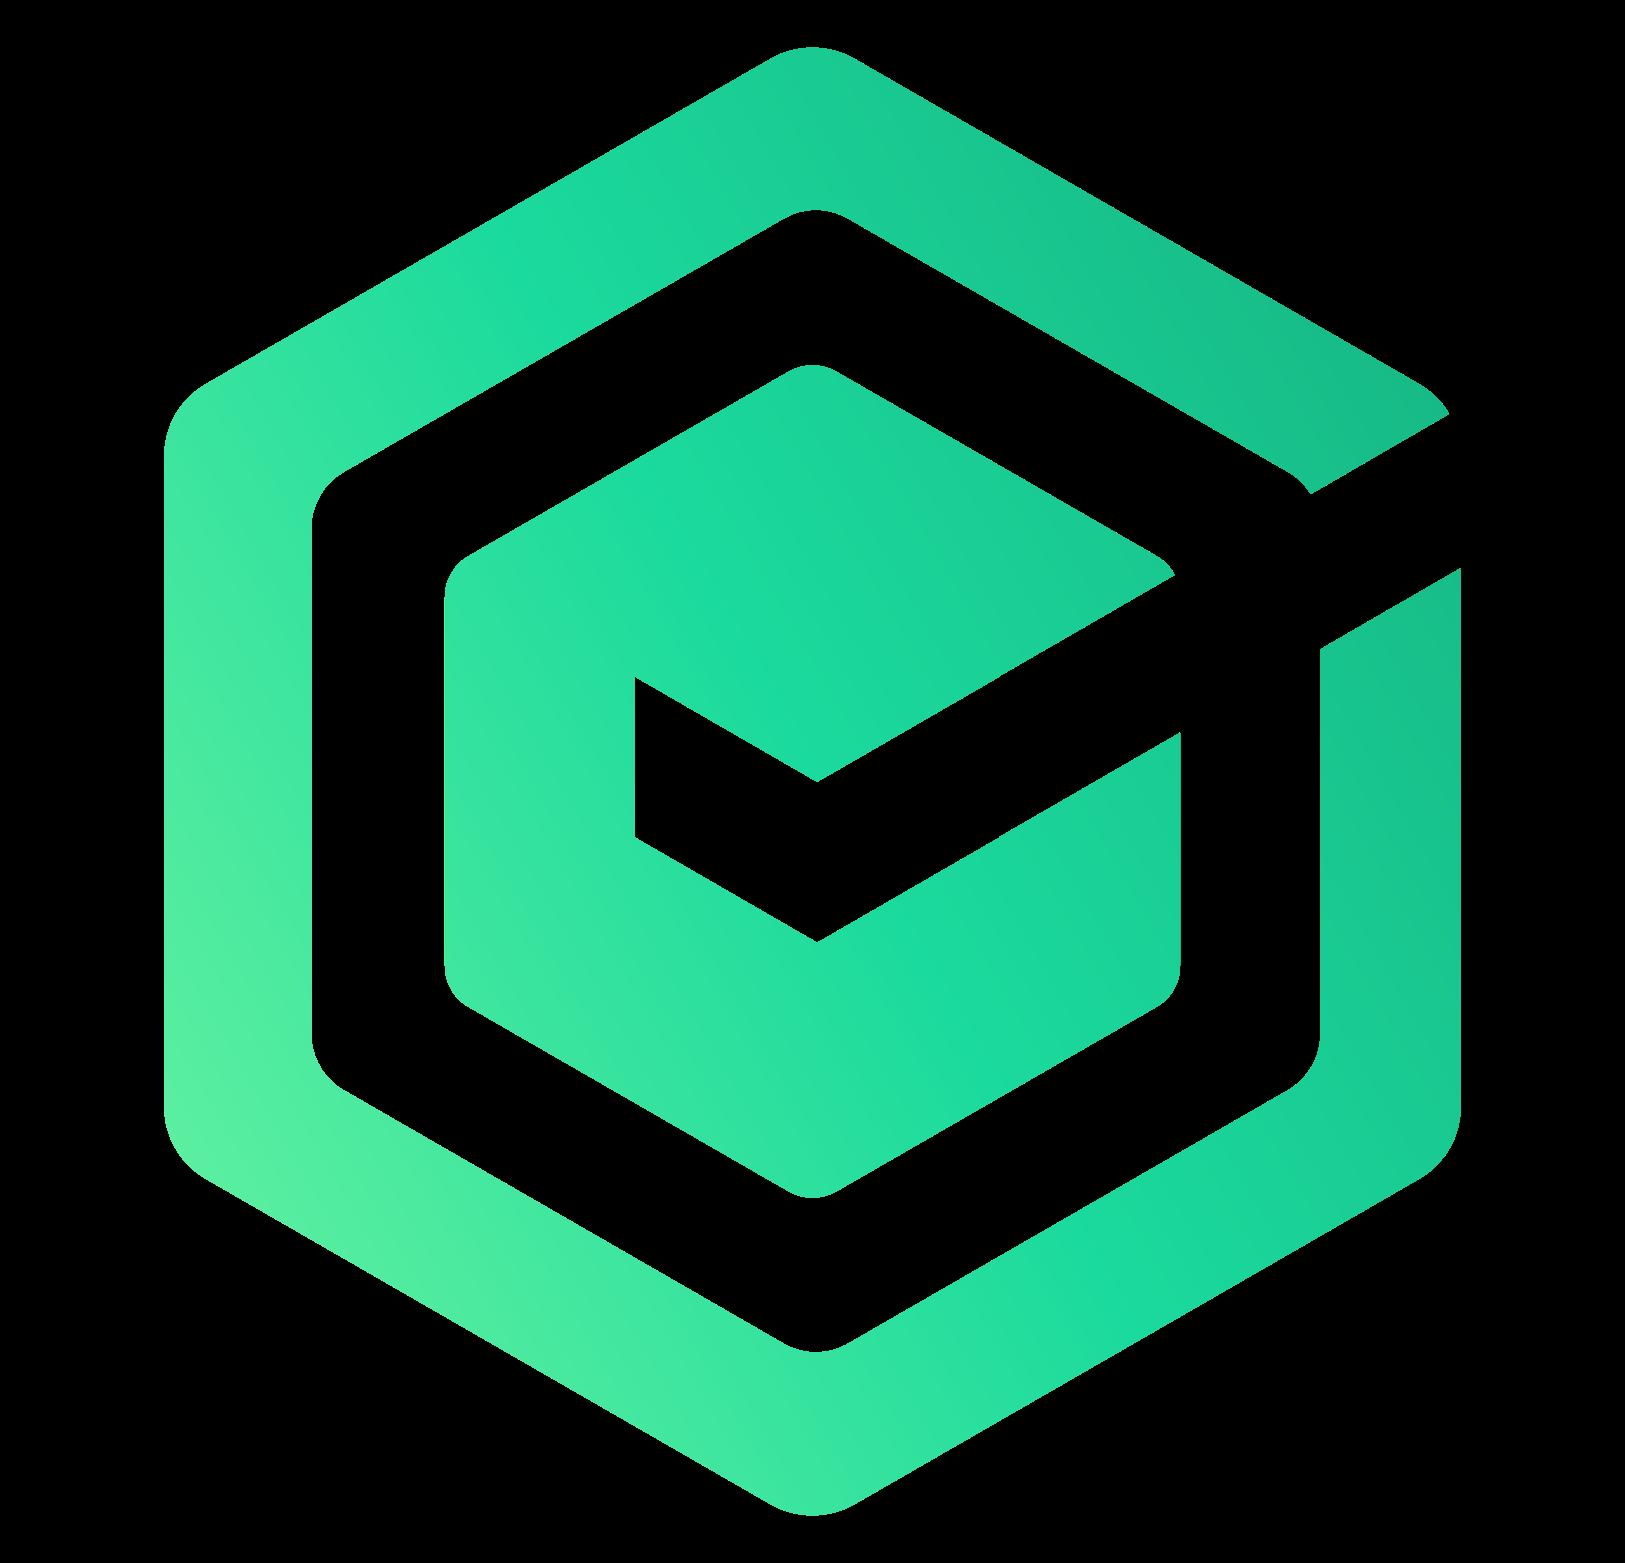 Checkbox logo